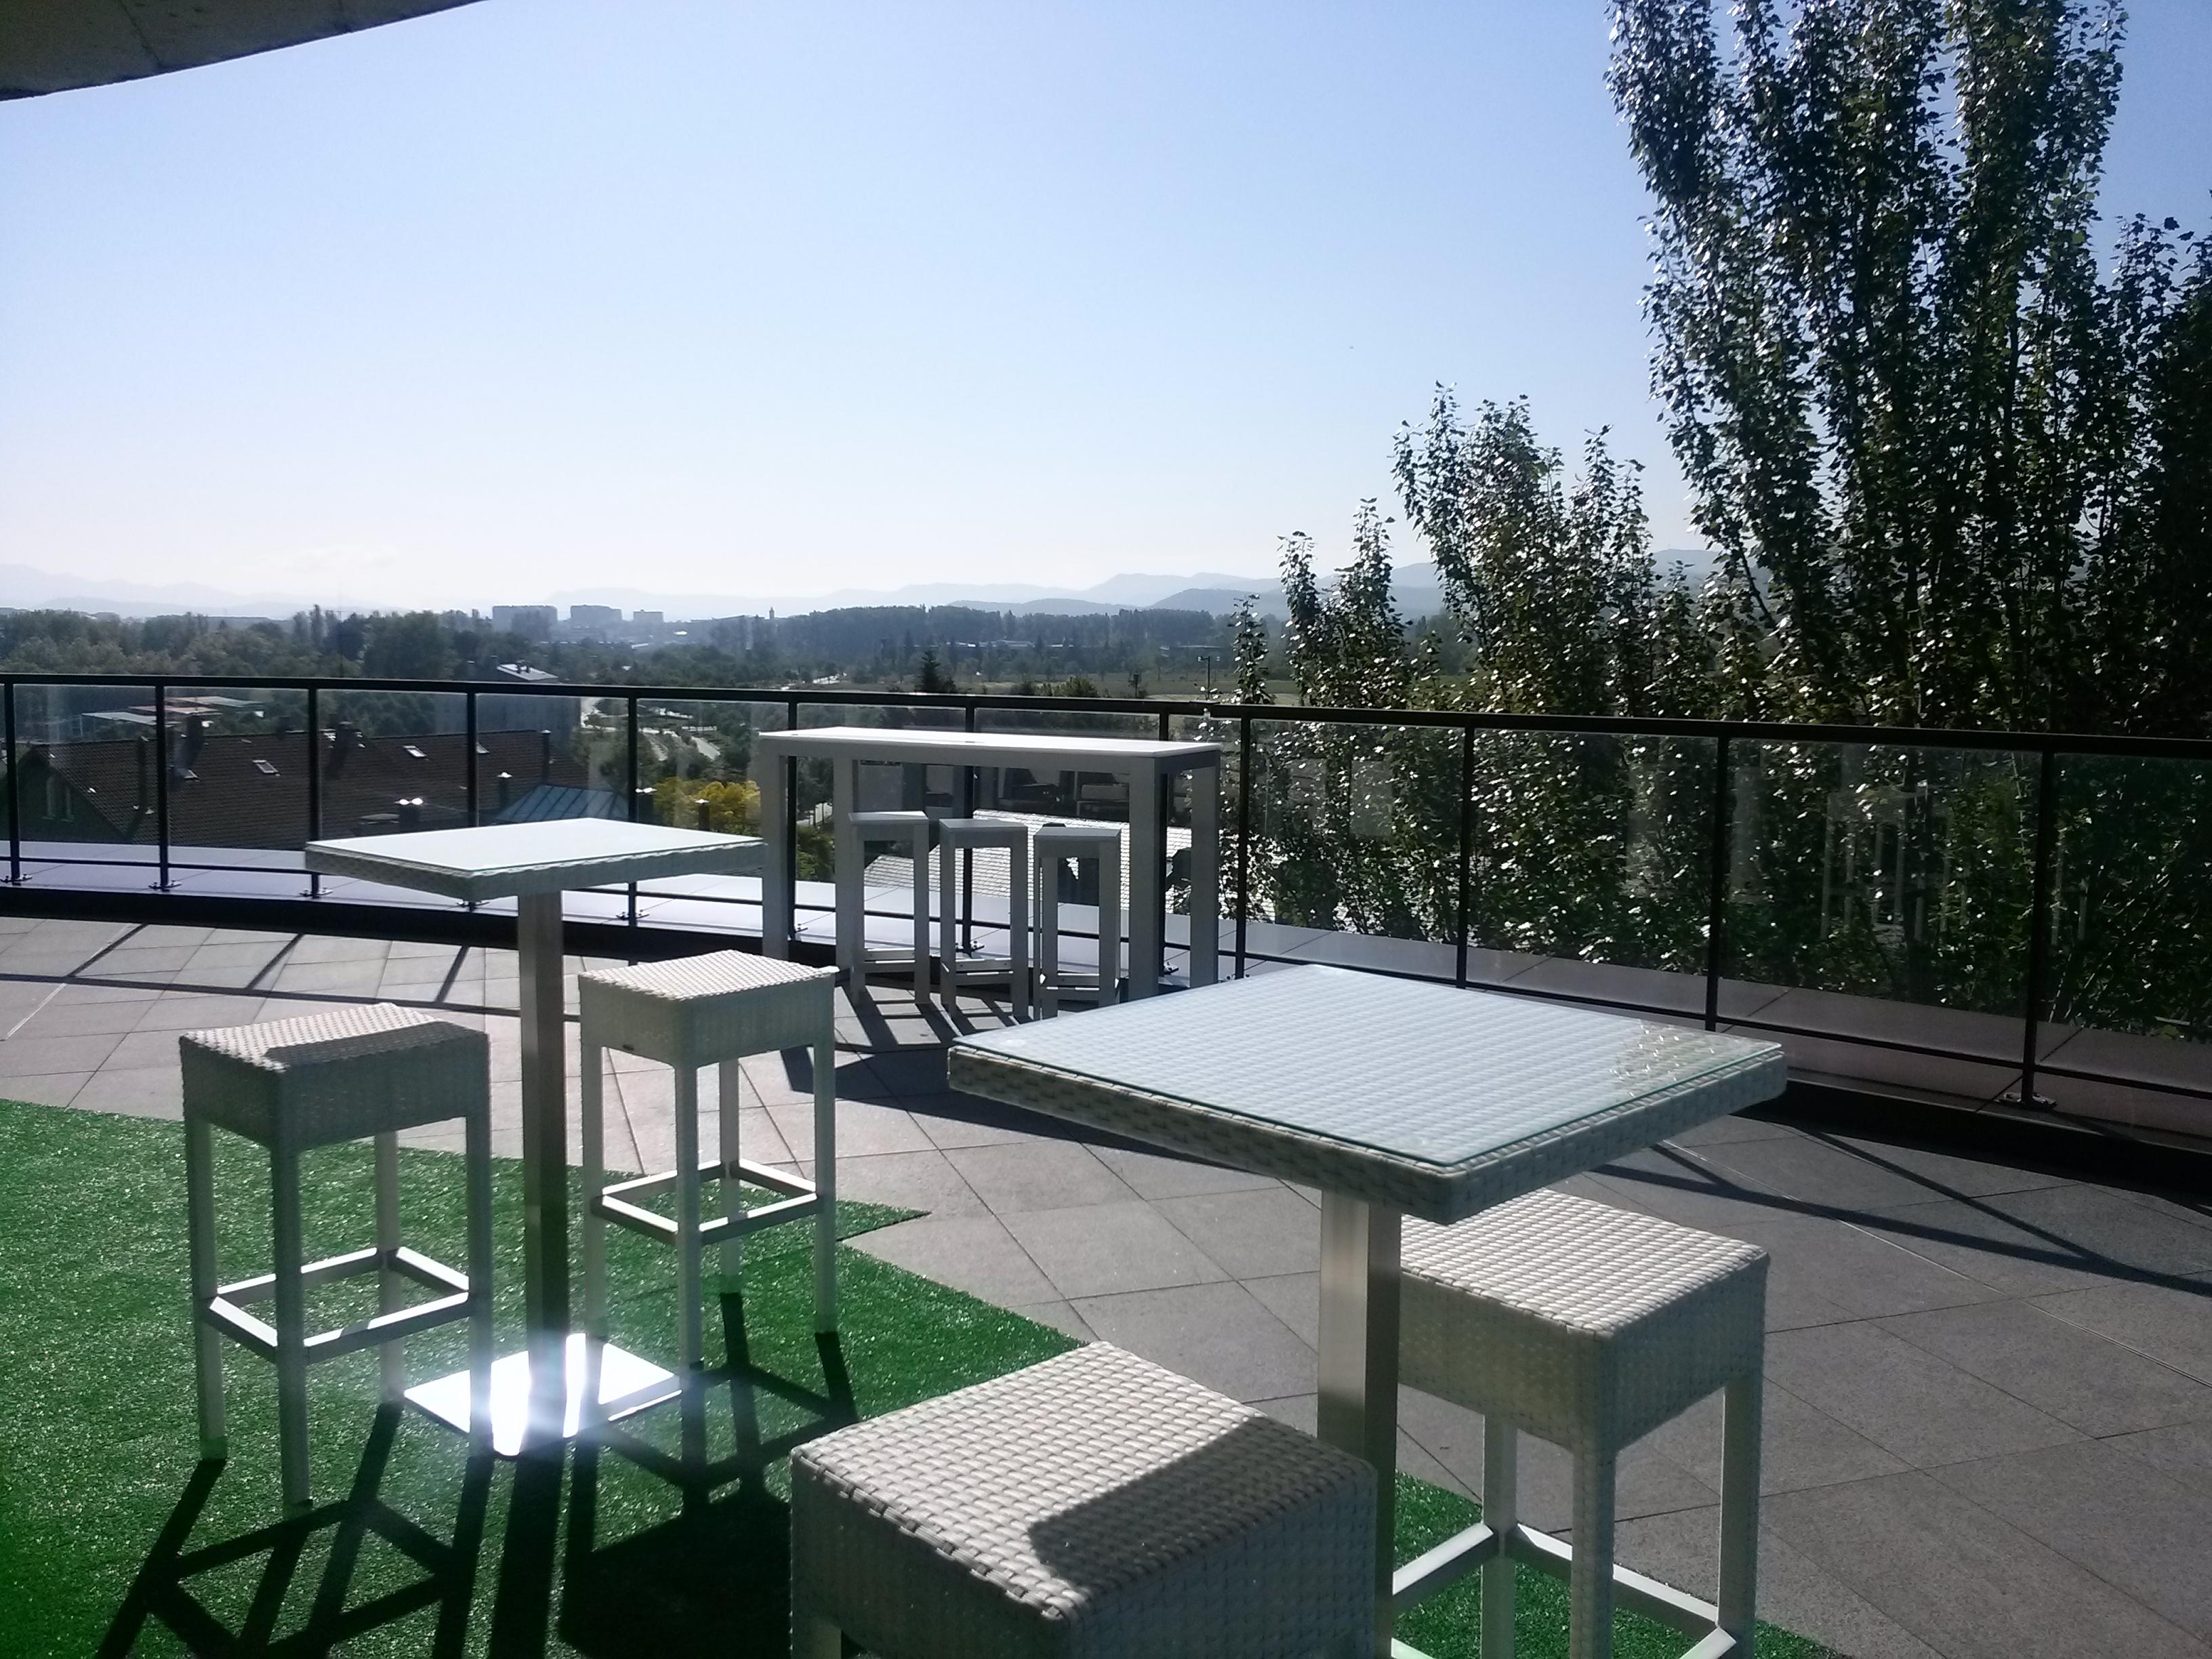 Zenit jardines de uleta suites hotel en vitoria viajes for Hoteles de lujo en vitoria